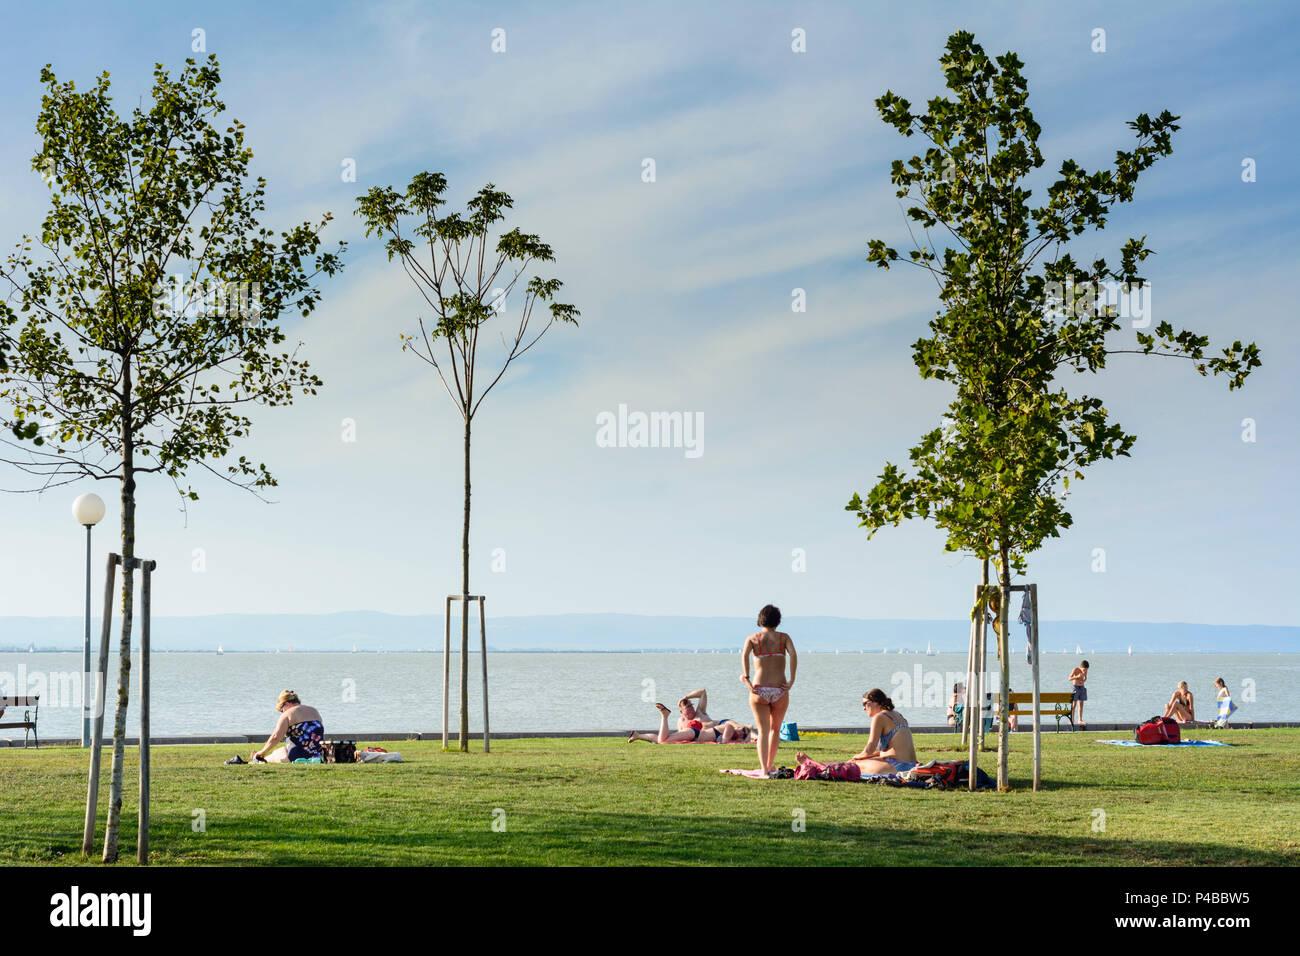 Illmitz, public bathing beach lido, Lake Neusiedl (Neusiedler See), sunbather, national park Neusiedler See-Seewinkel, Burgenland, Austria - Stock Image